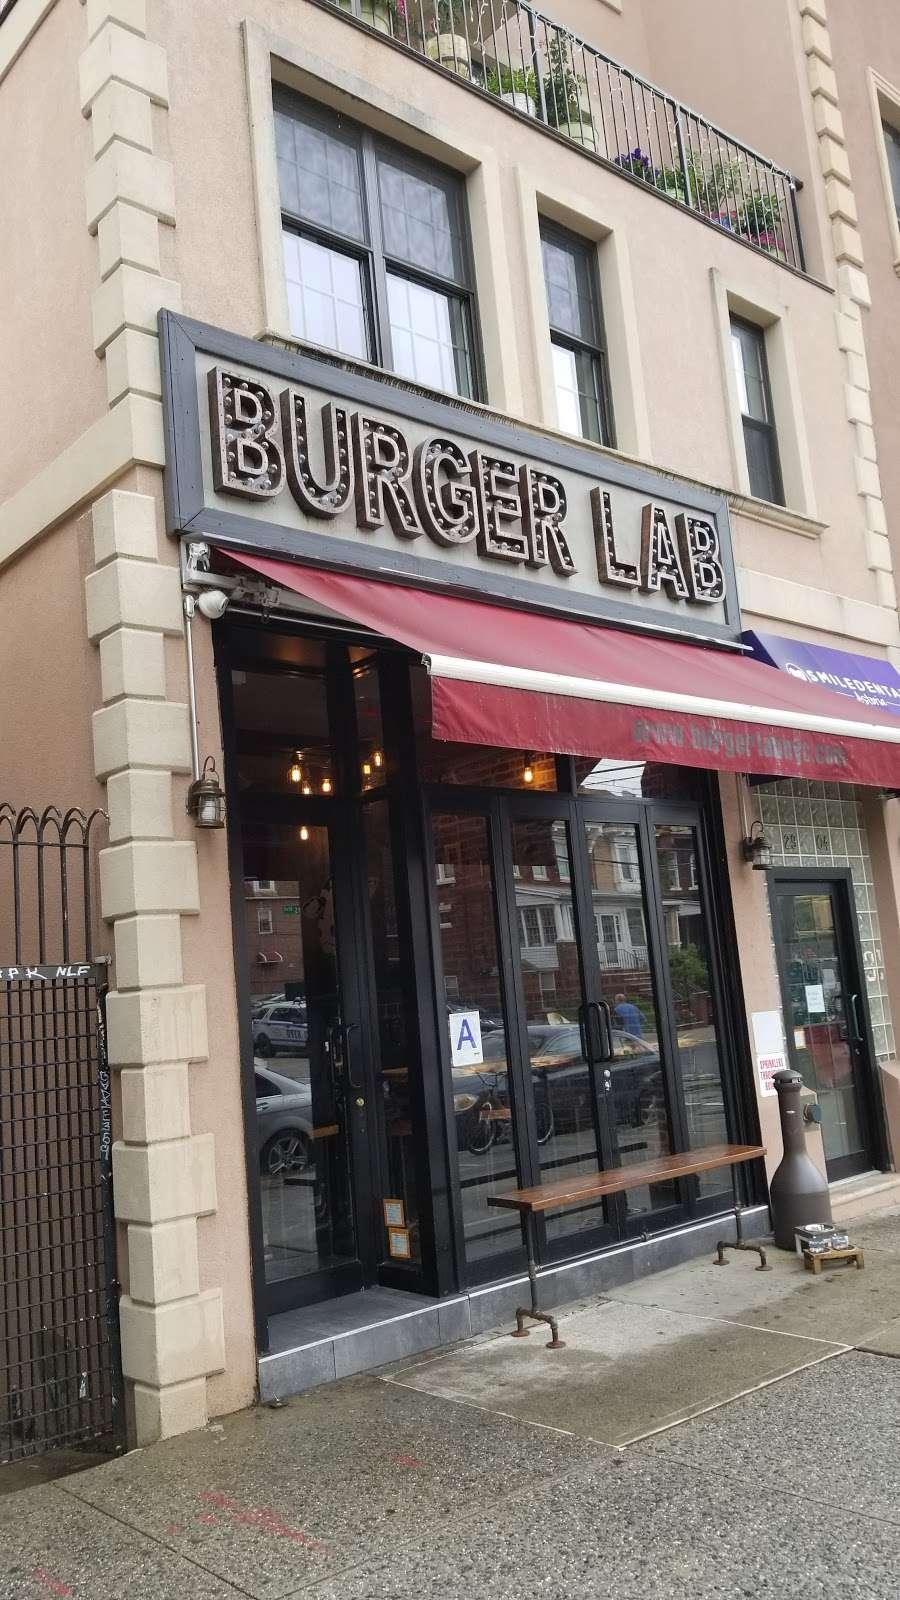 Burger Lab - restaurant  | Photo 3 of 10 | Address: 29-04 Ditmars Blvd, Long Island City, NY 11105, USA | Phone: (929) 454-8825